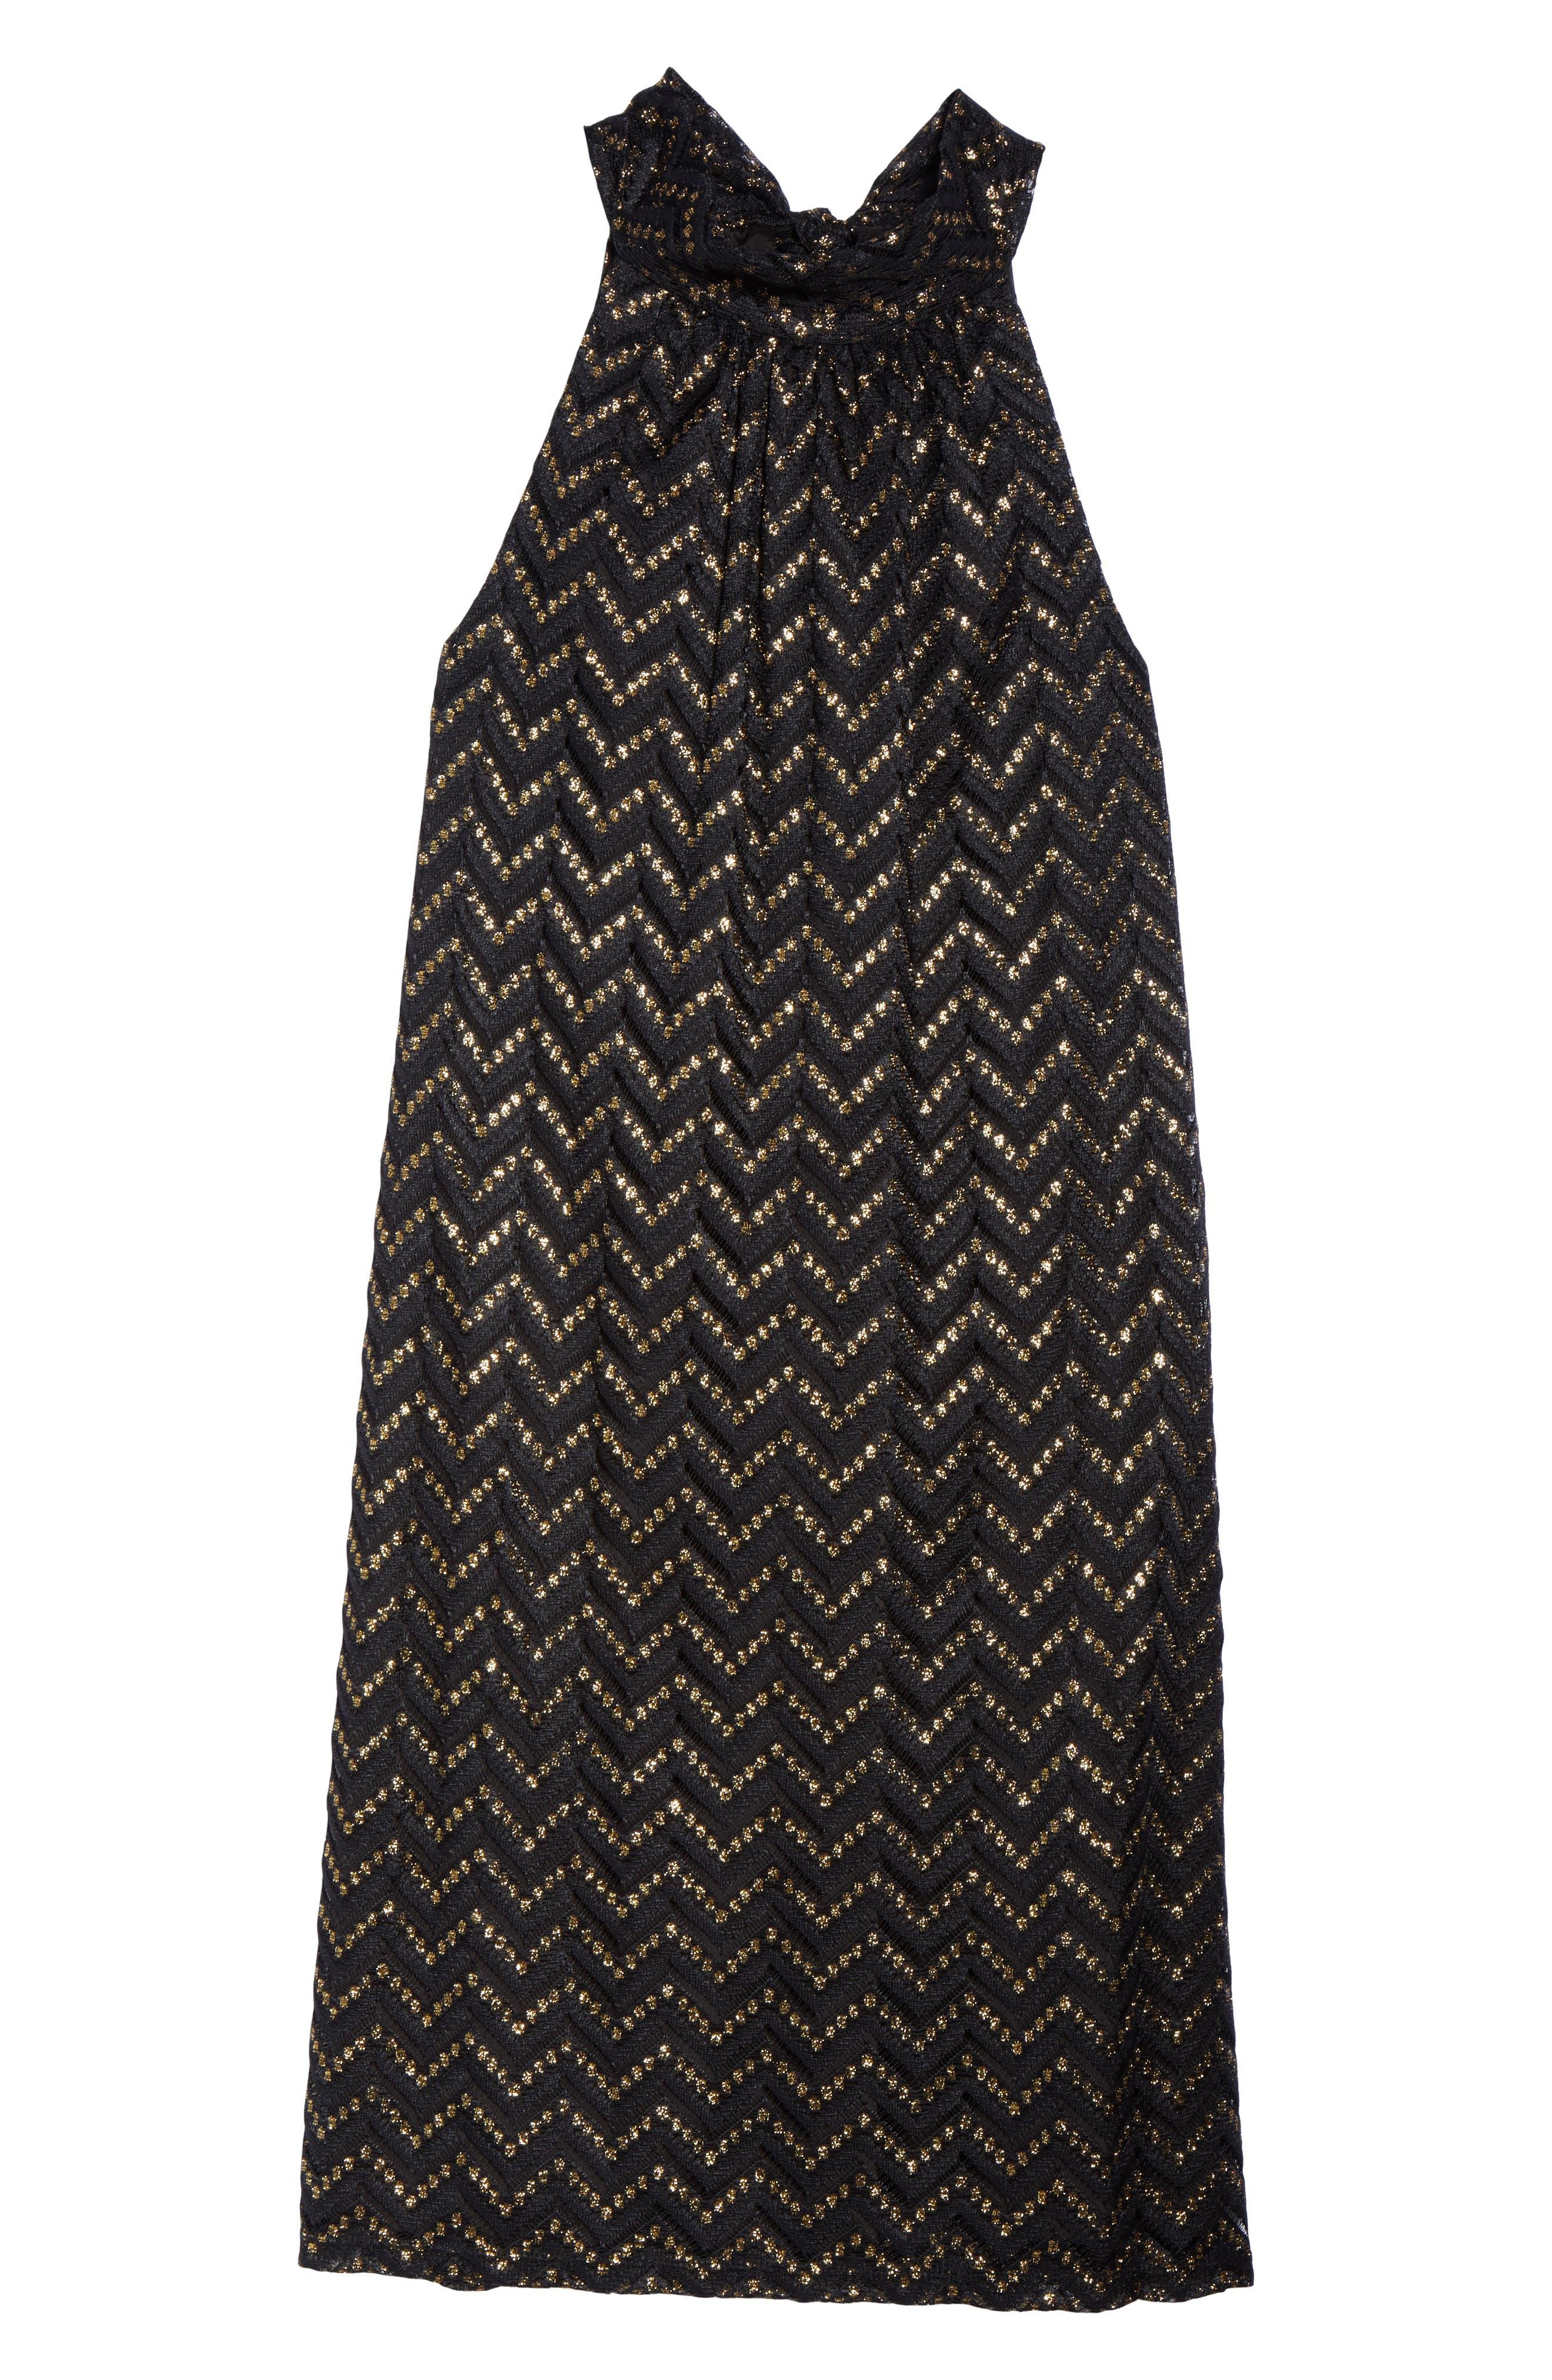 Morrison Metallic Shift Dress,                             Alternate thumbnail 6, color,                             008